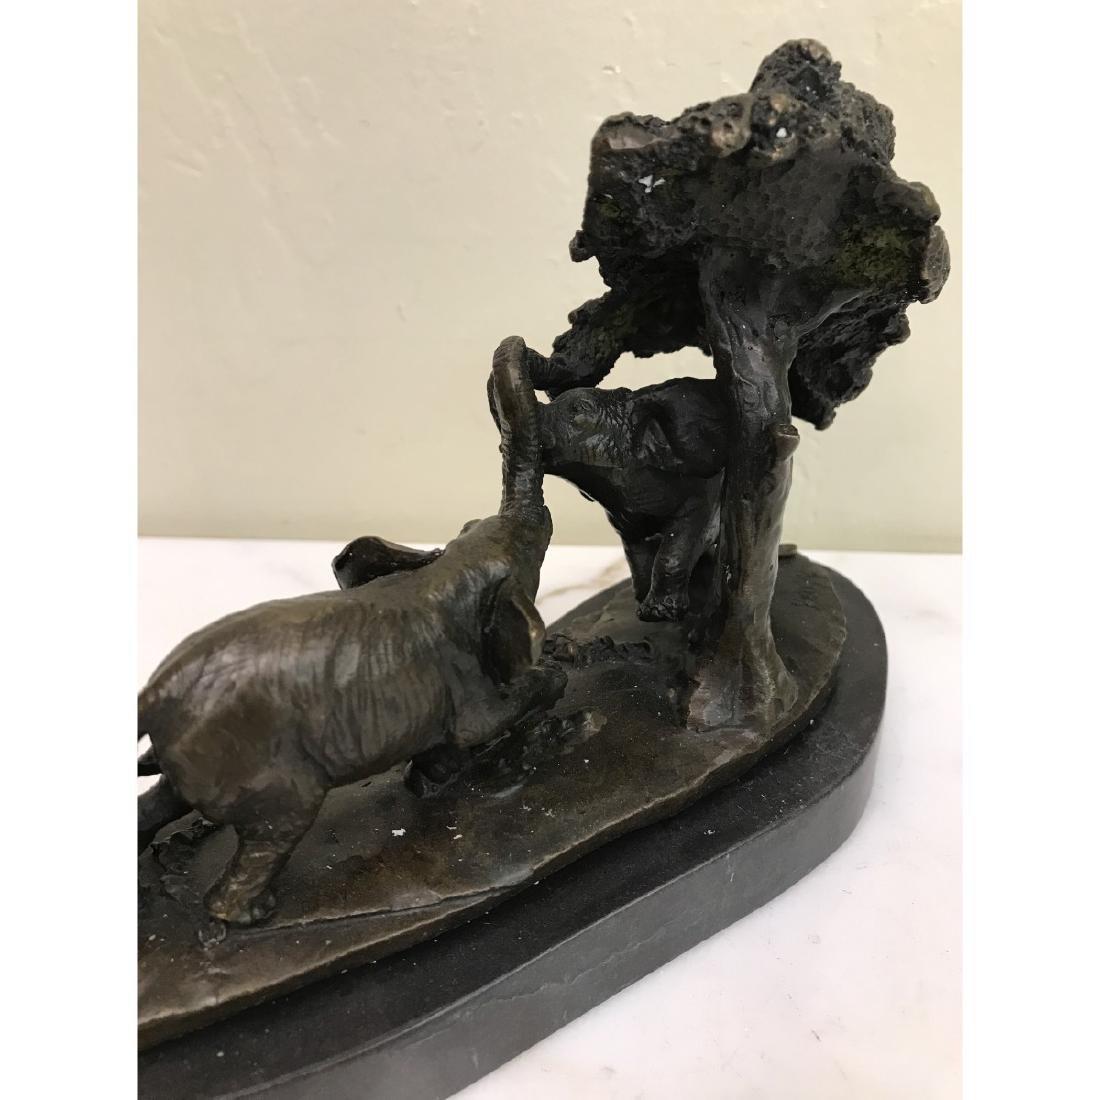 Miniature Bronze Statue of Group of Elephants - 4